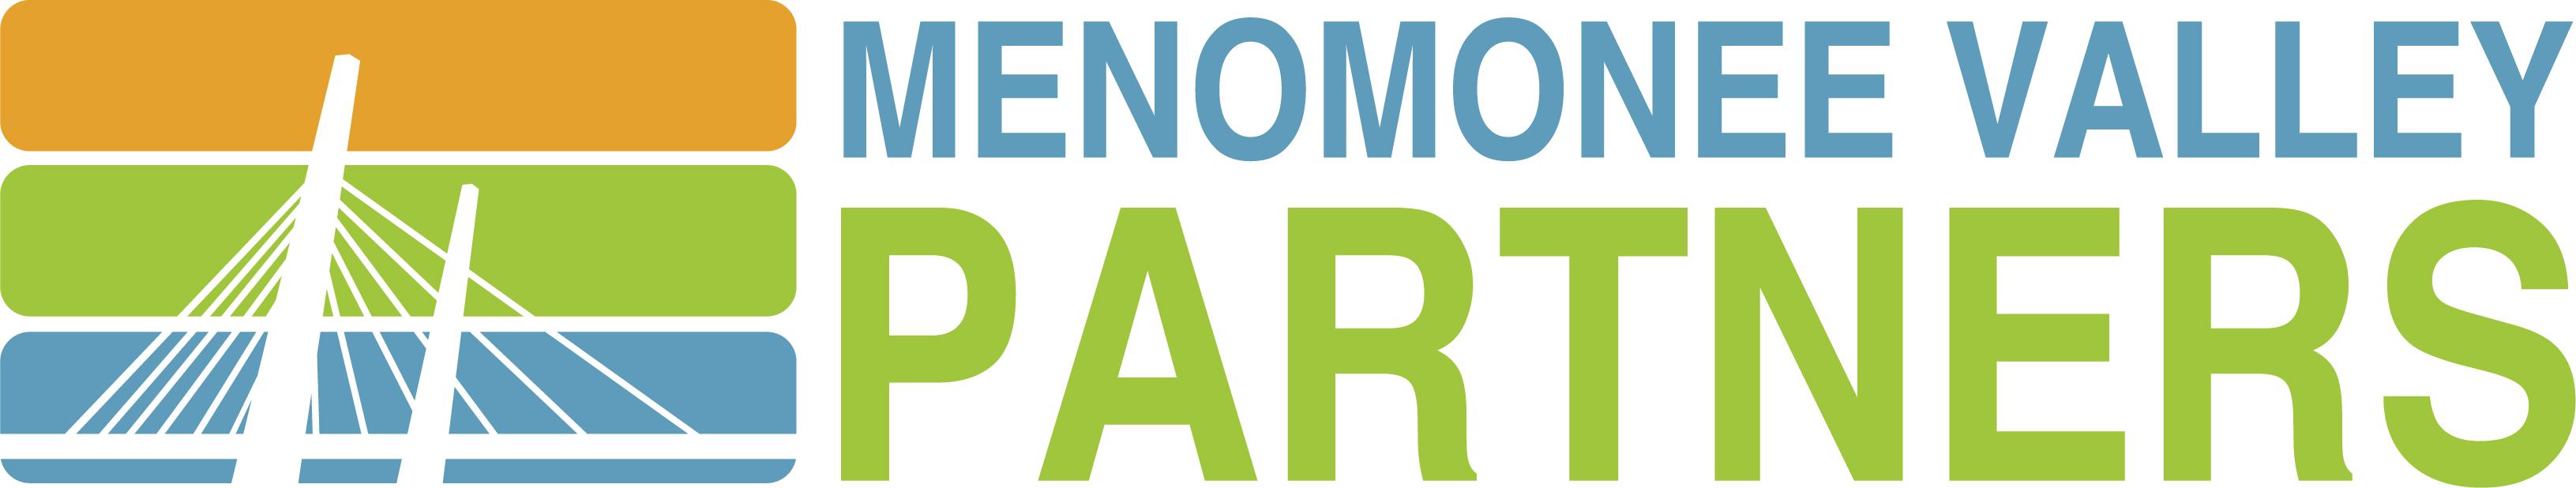 Menomonee Valley Partners Horizontal Logo